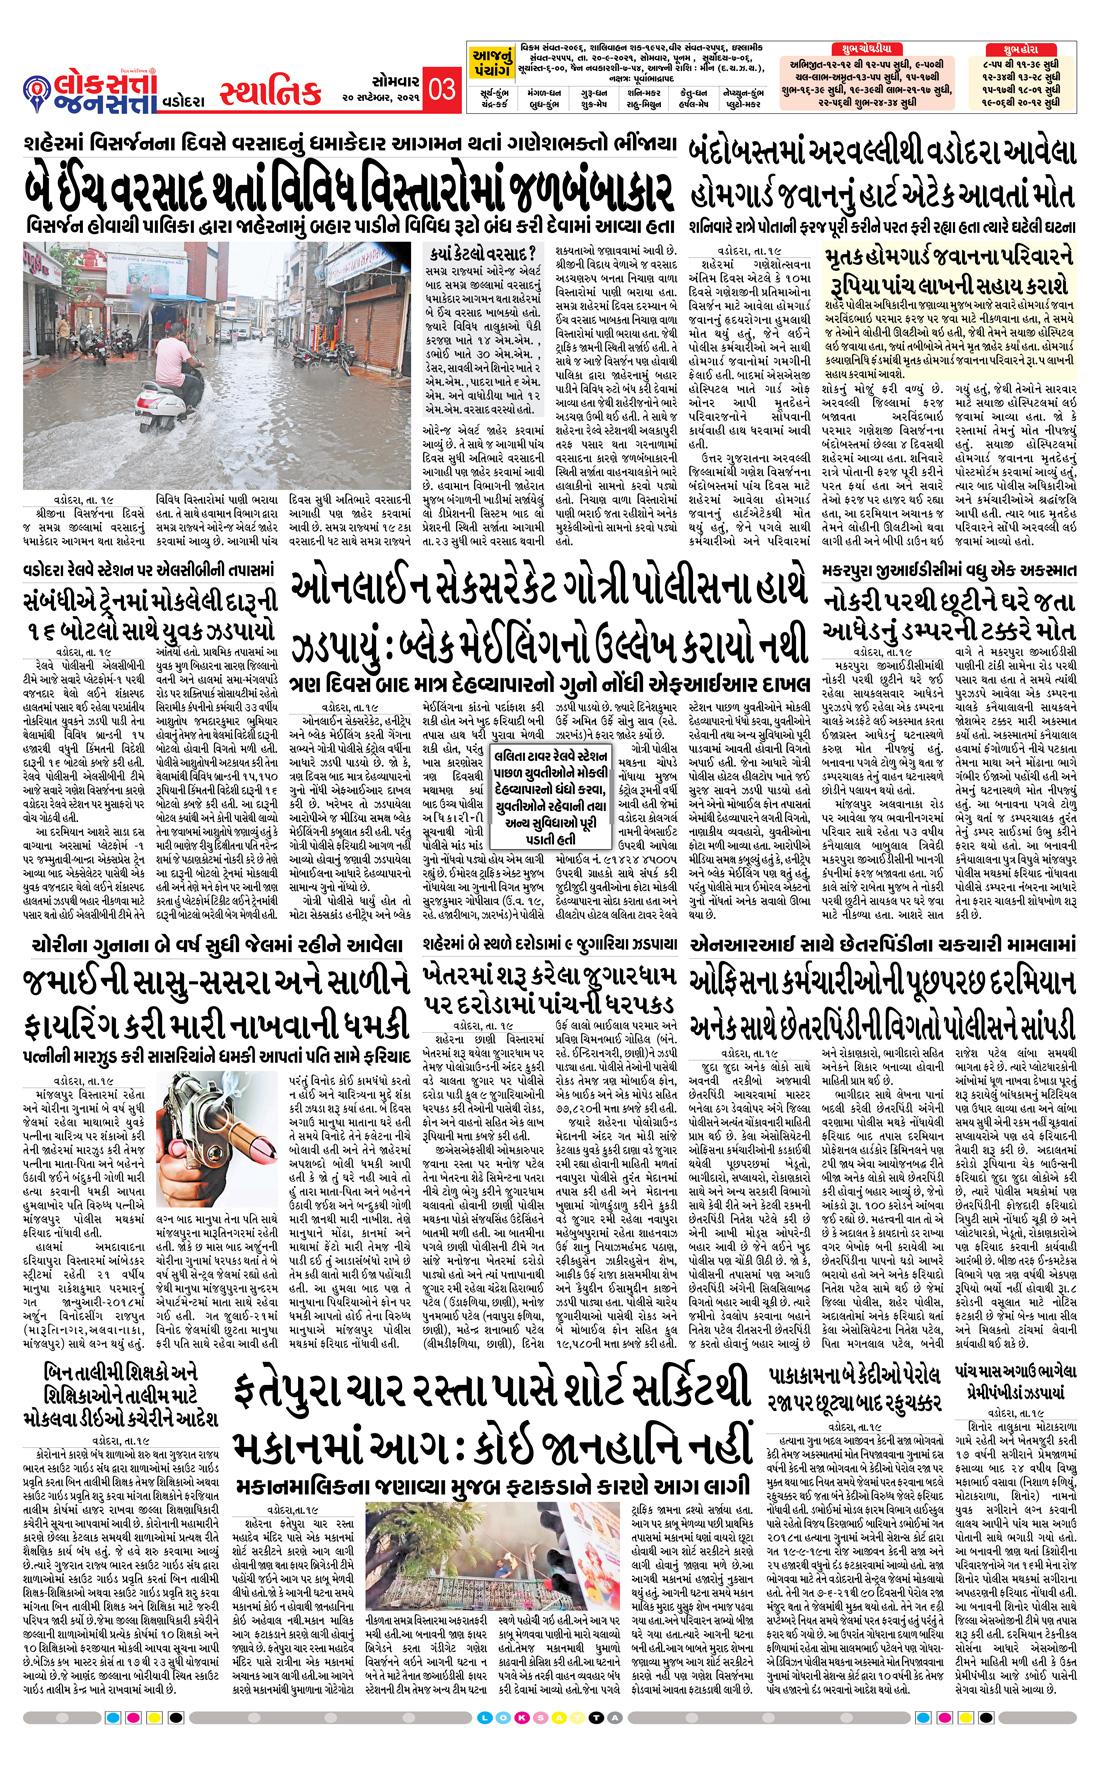 Loksatta Jansatta News Papaer E-paper dated 2021-09-20 | Page 3